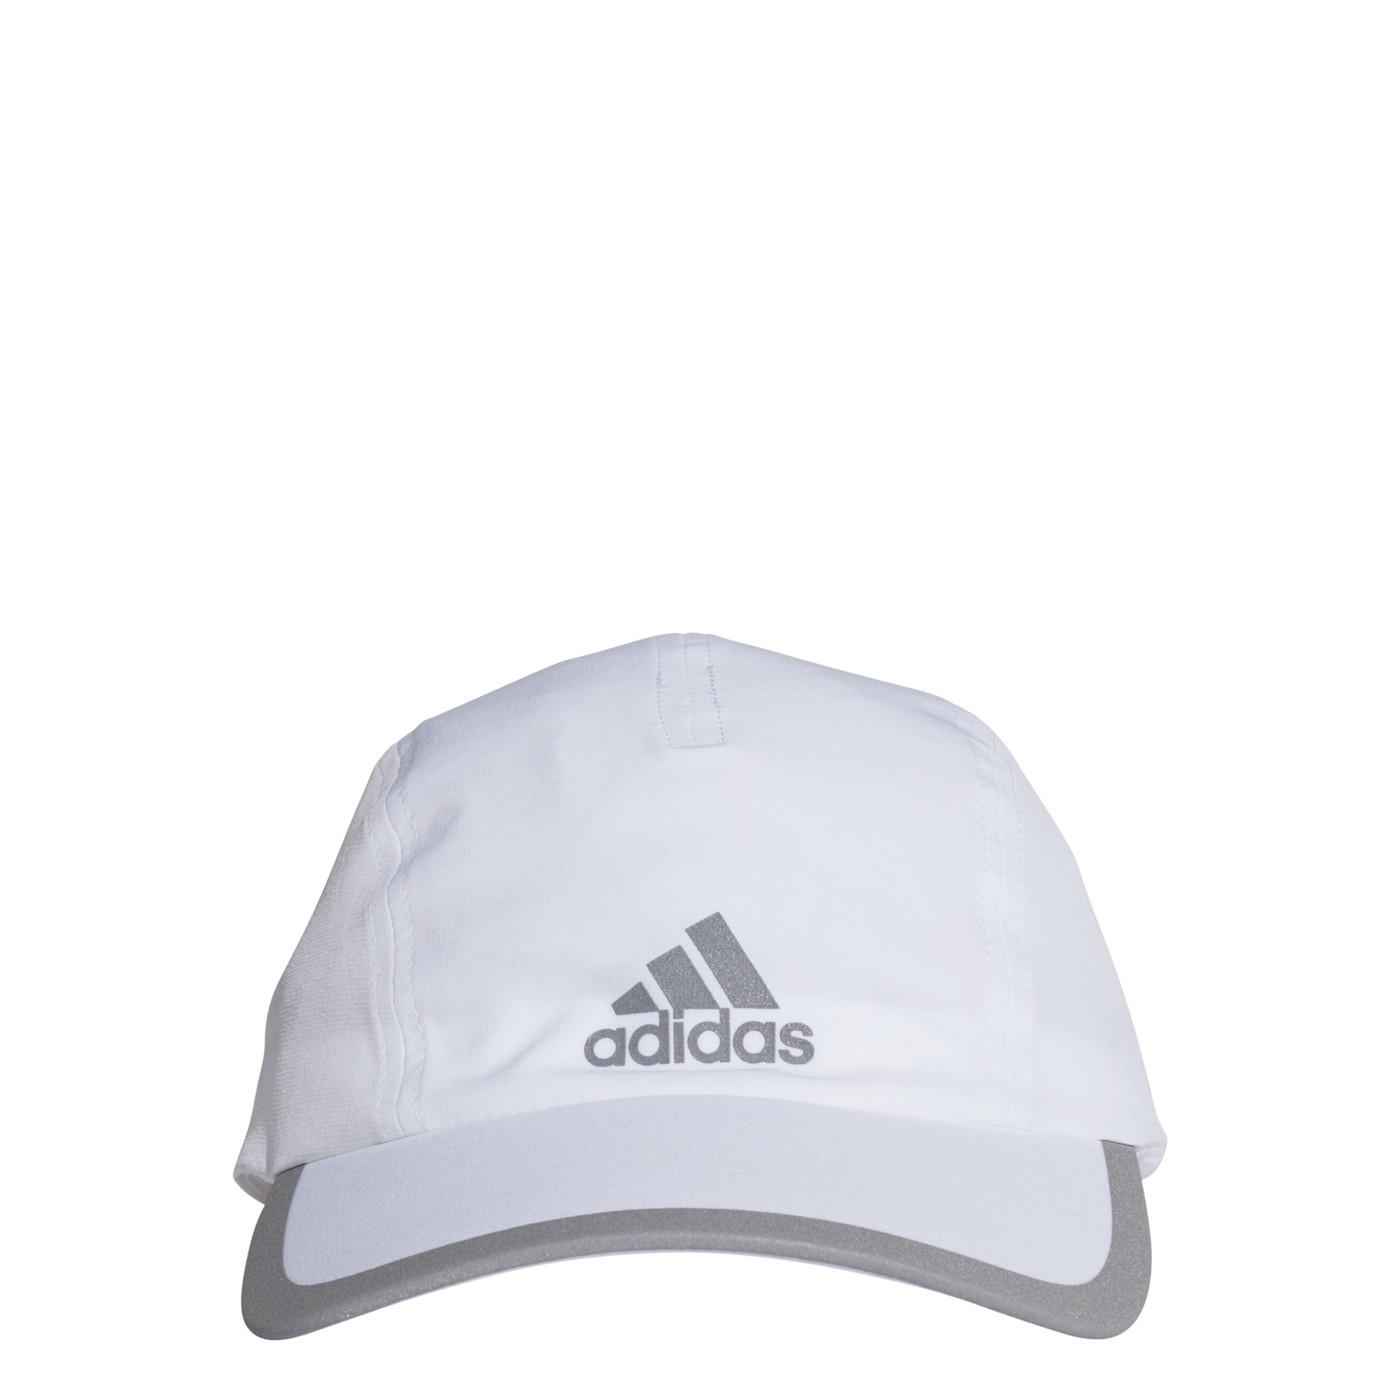 ADIDAS R96 CL CAP - Herren